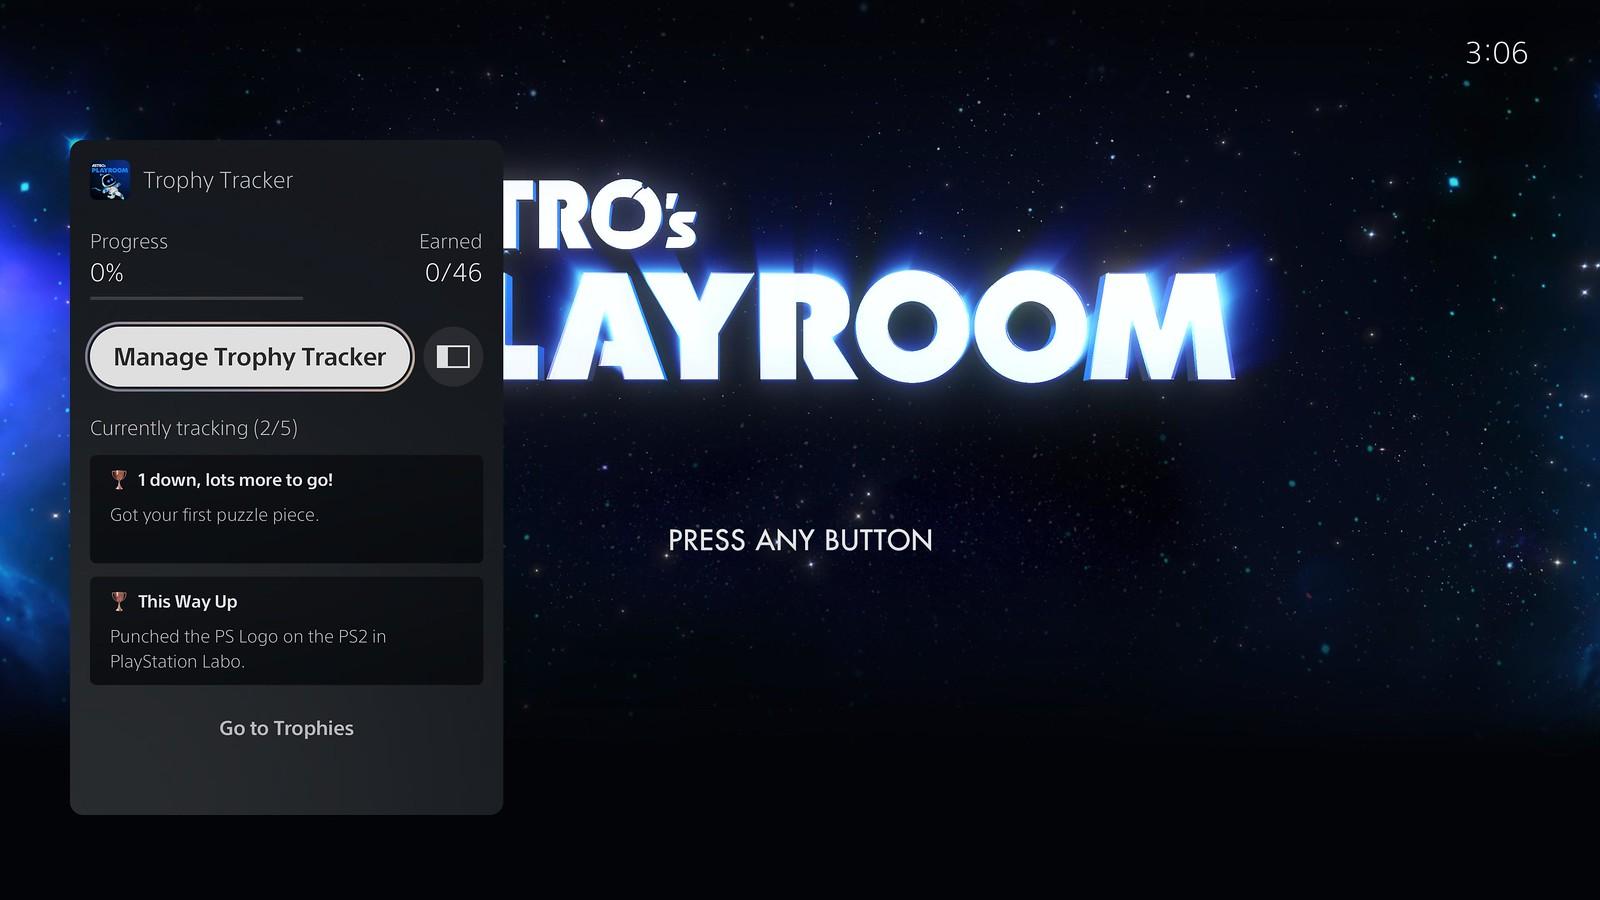 PlayStation 5 trophy tracker